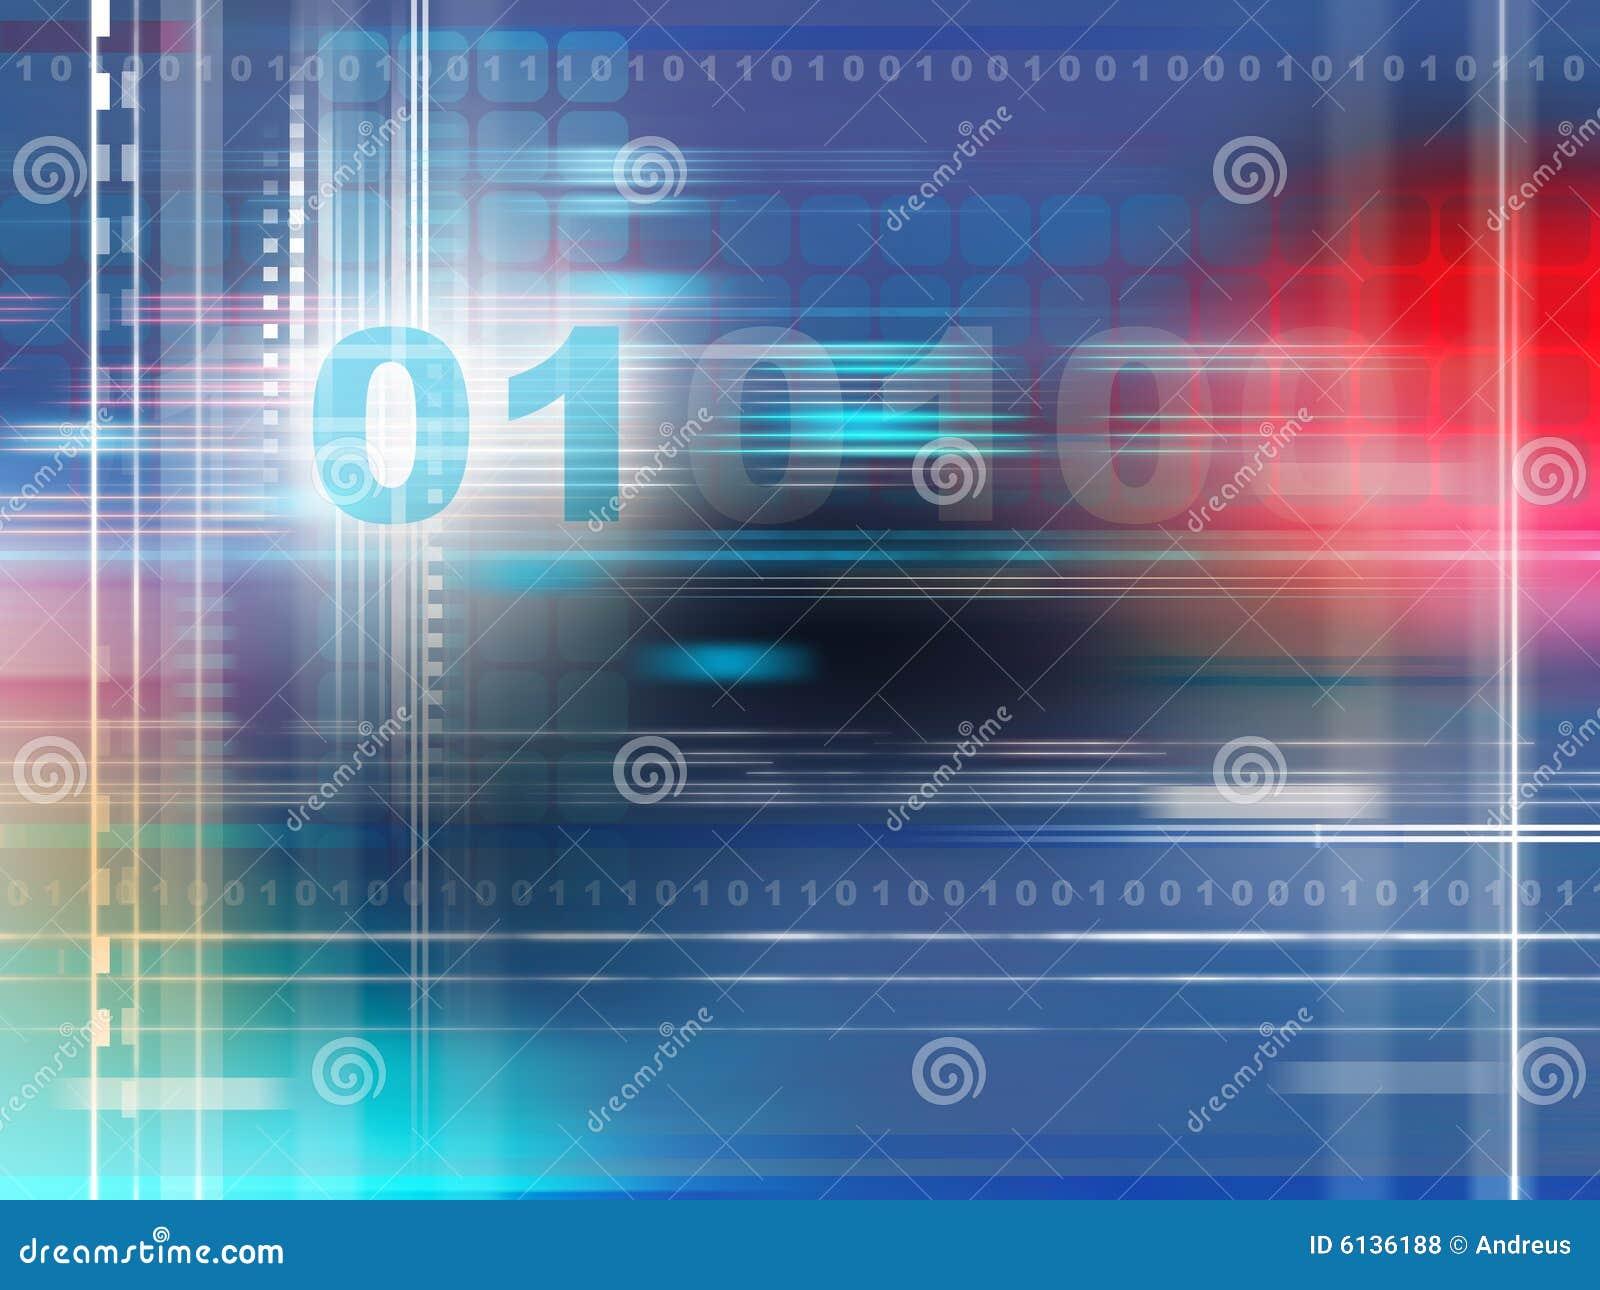 Free Internet Security >> Data Stream Royalty Free Stock Photos - Image: 6136188